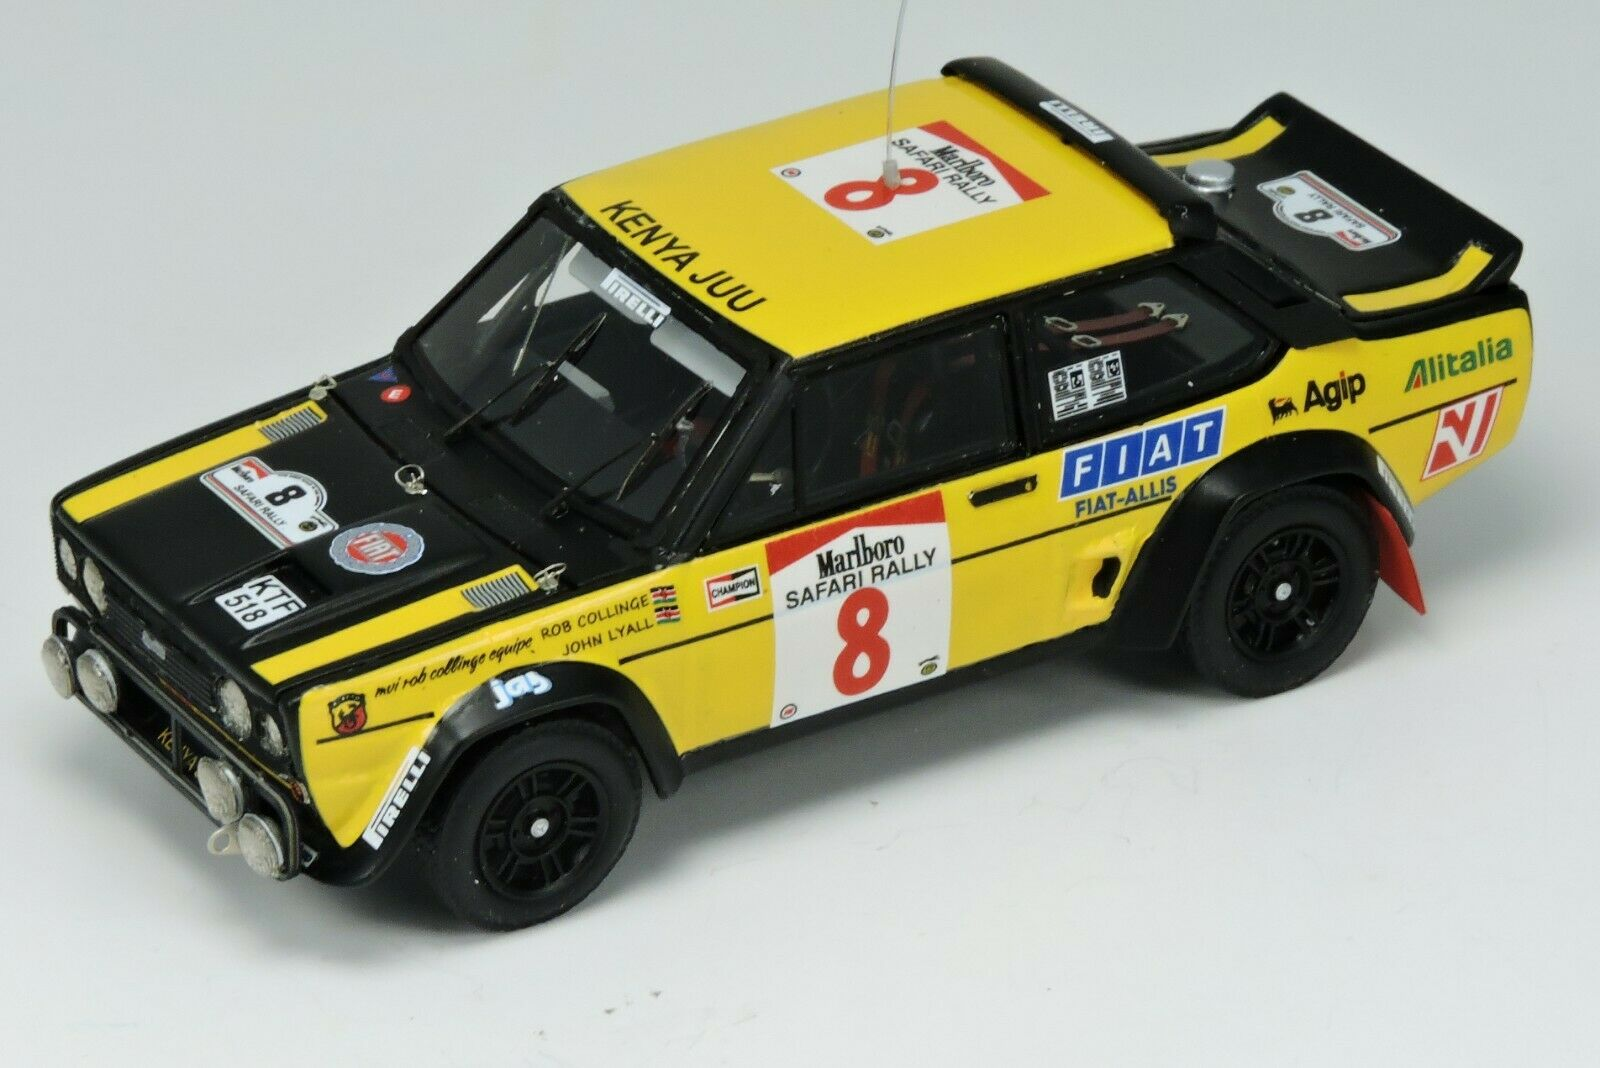 Kit Fiat 131 Abarth  8 Collinge-Lyall Safari Rally 1981 - Arena Models kit 1 43